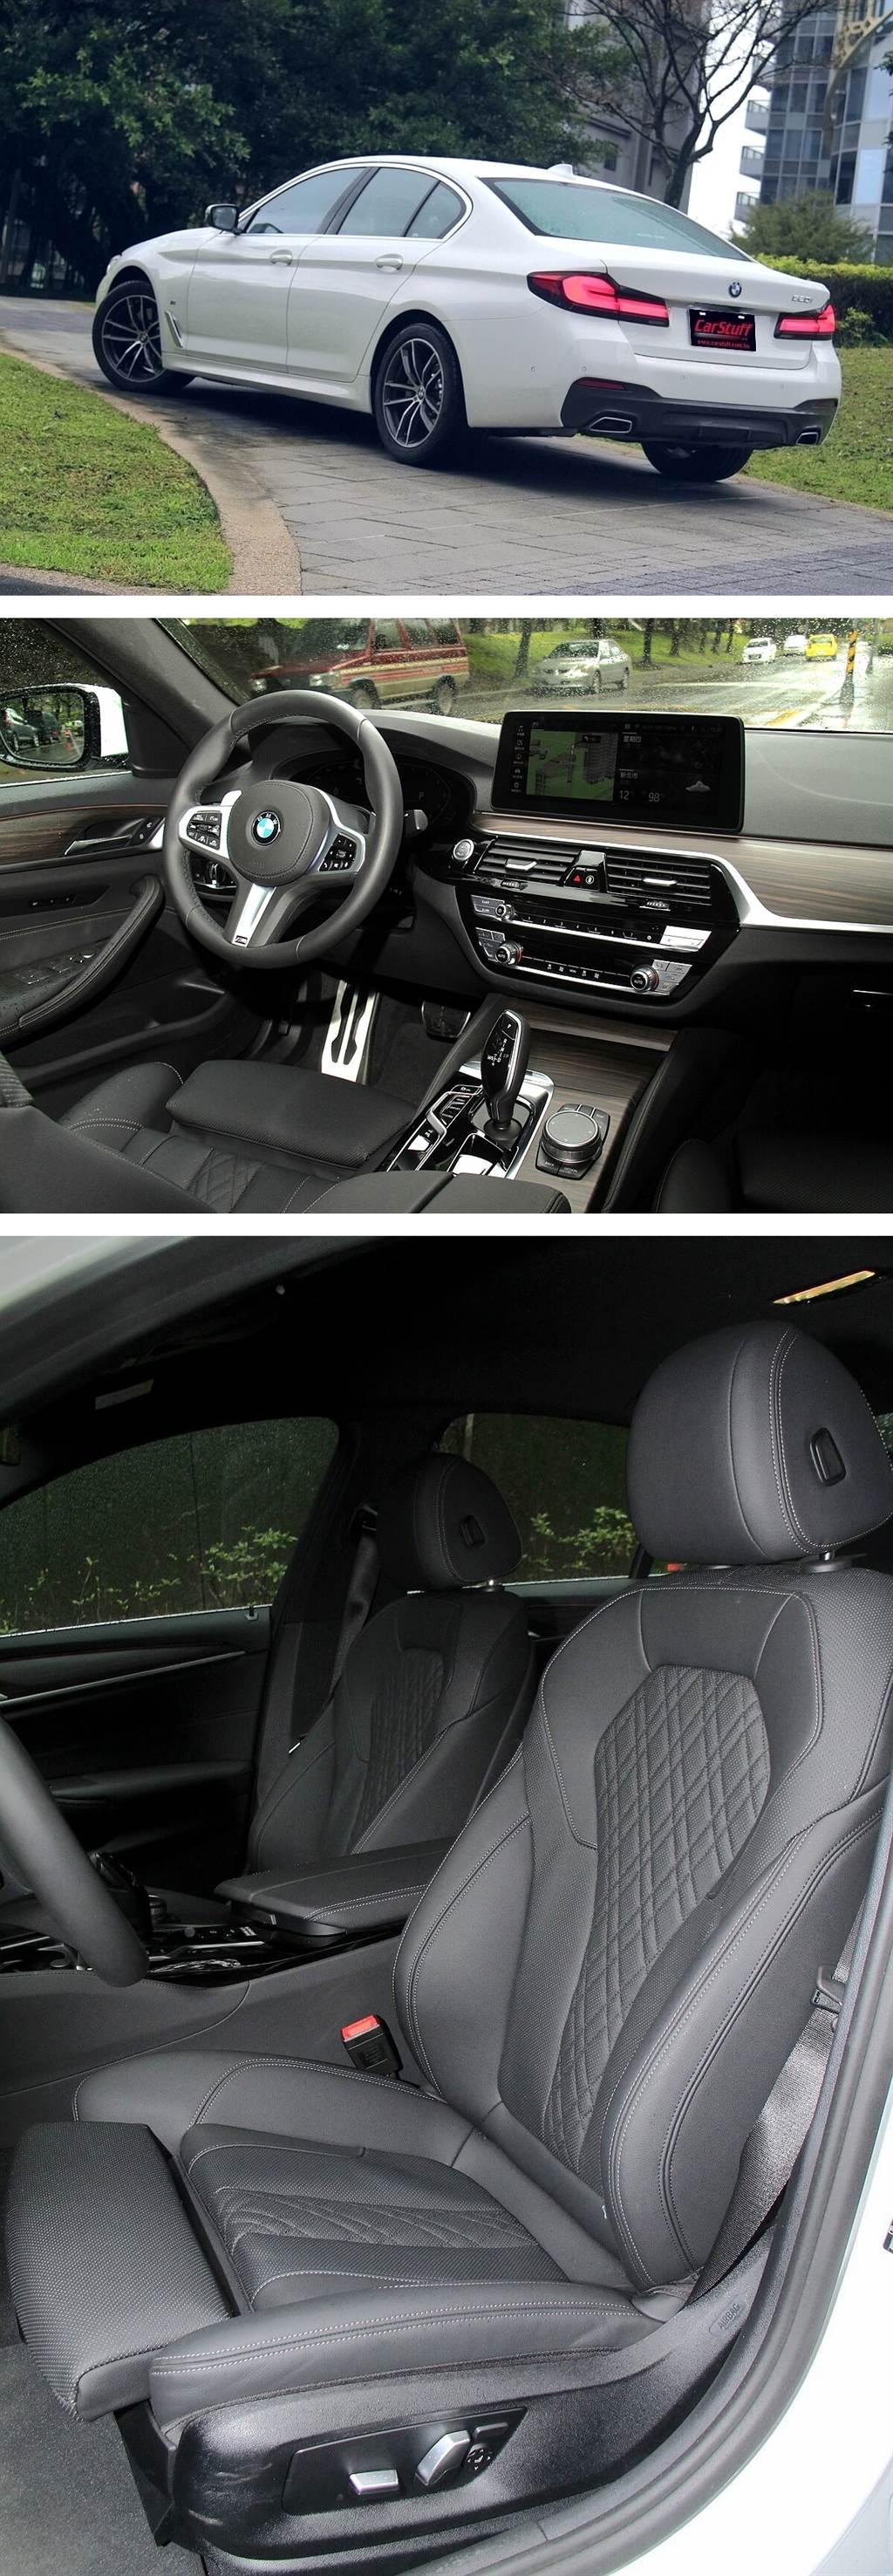 520i M Sport配置了新款Sensatec 2.0皮質包覆的專屬跑車式座椅,這是BMW第一次採用Sensatec合成皮革製作的跑車座椅。新版Sensatec 2.0除了皮革質感更加柔軟較一般合成皮革更接近真皮,以及側面包覆比標準款座椅加厚之外,還新增了透氣口以及菱格紋縫線的高質感設計。